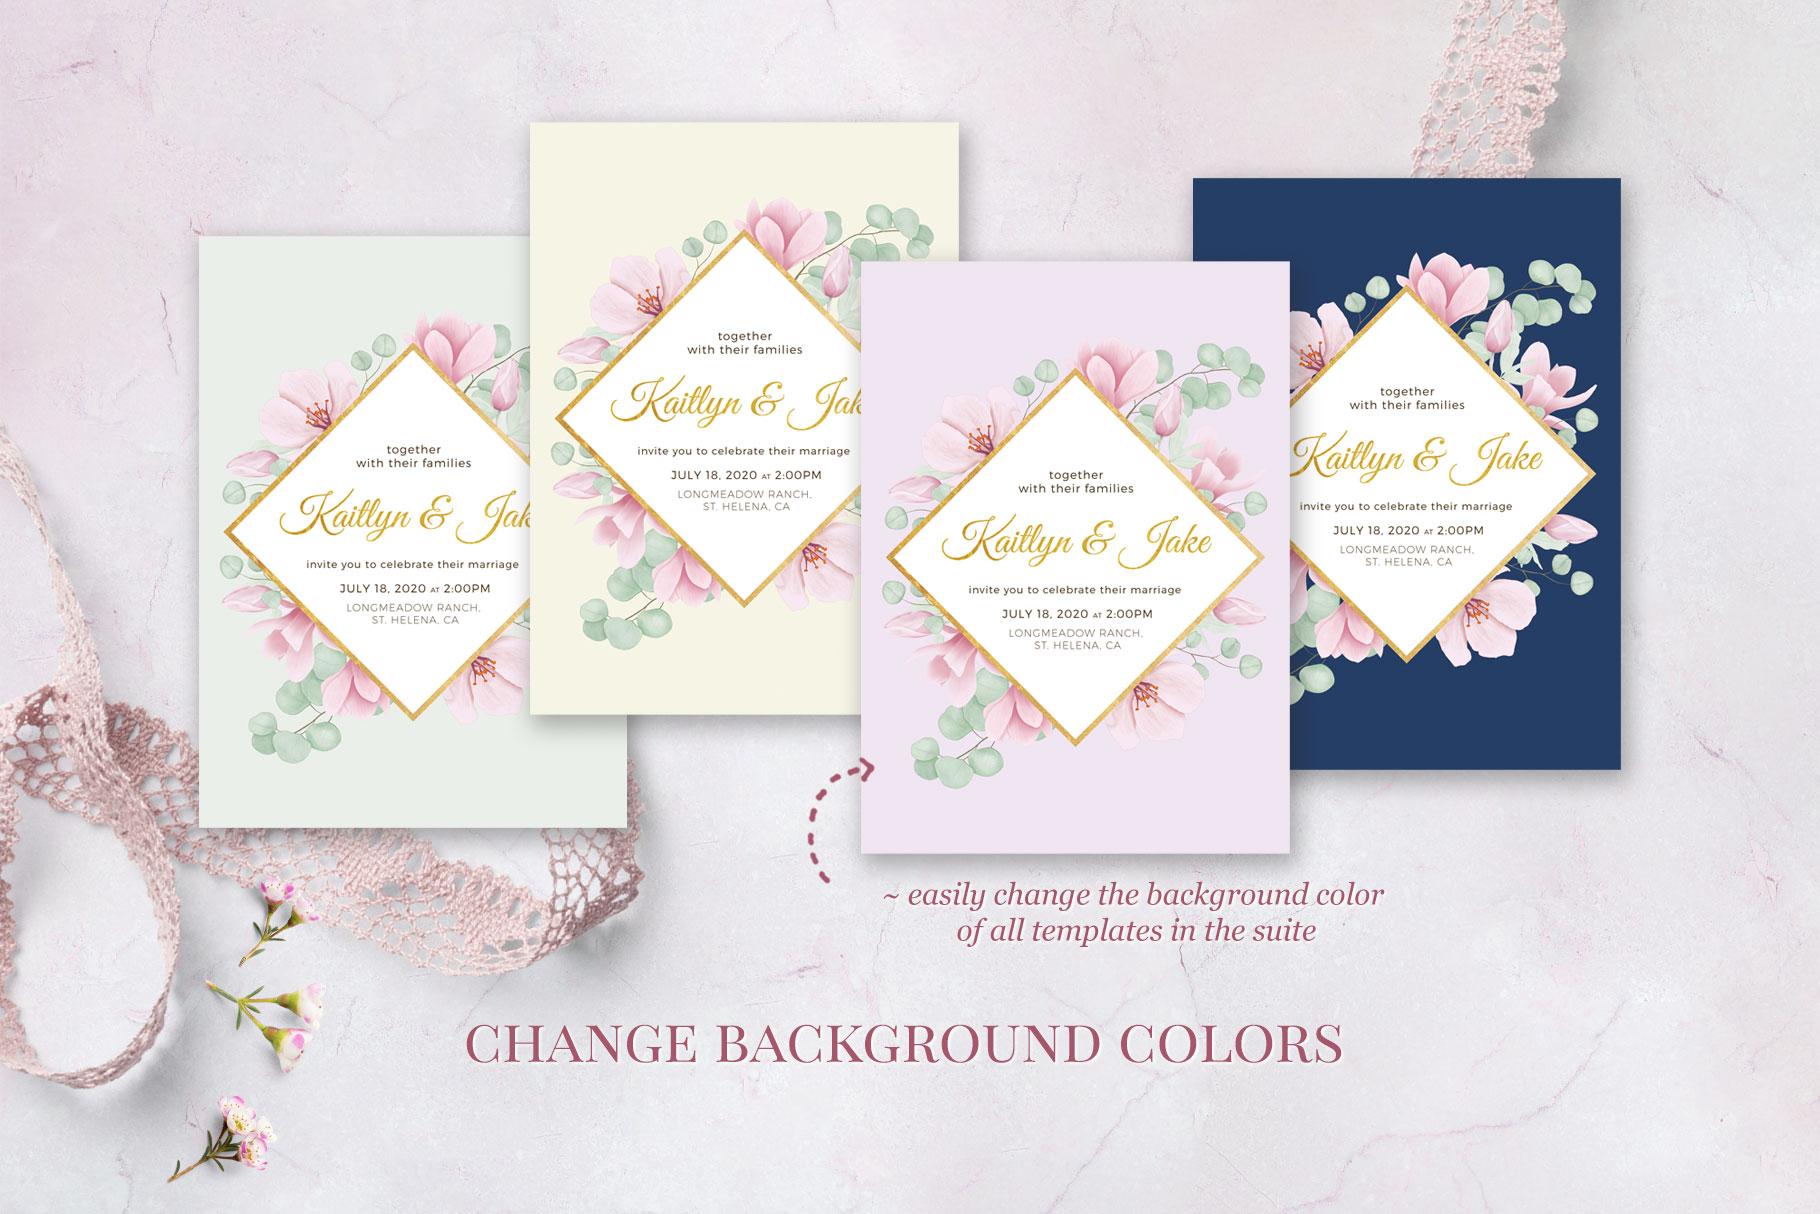 Magnolia & Eucalyptus Wedding Suite example image 6